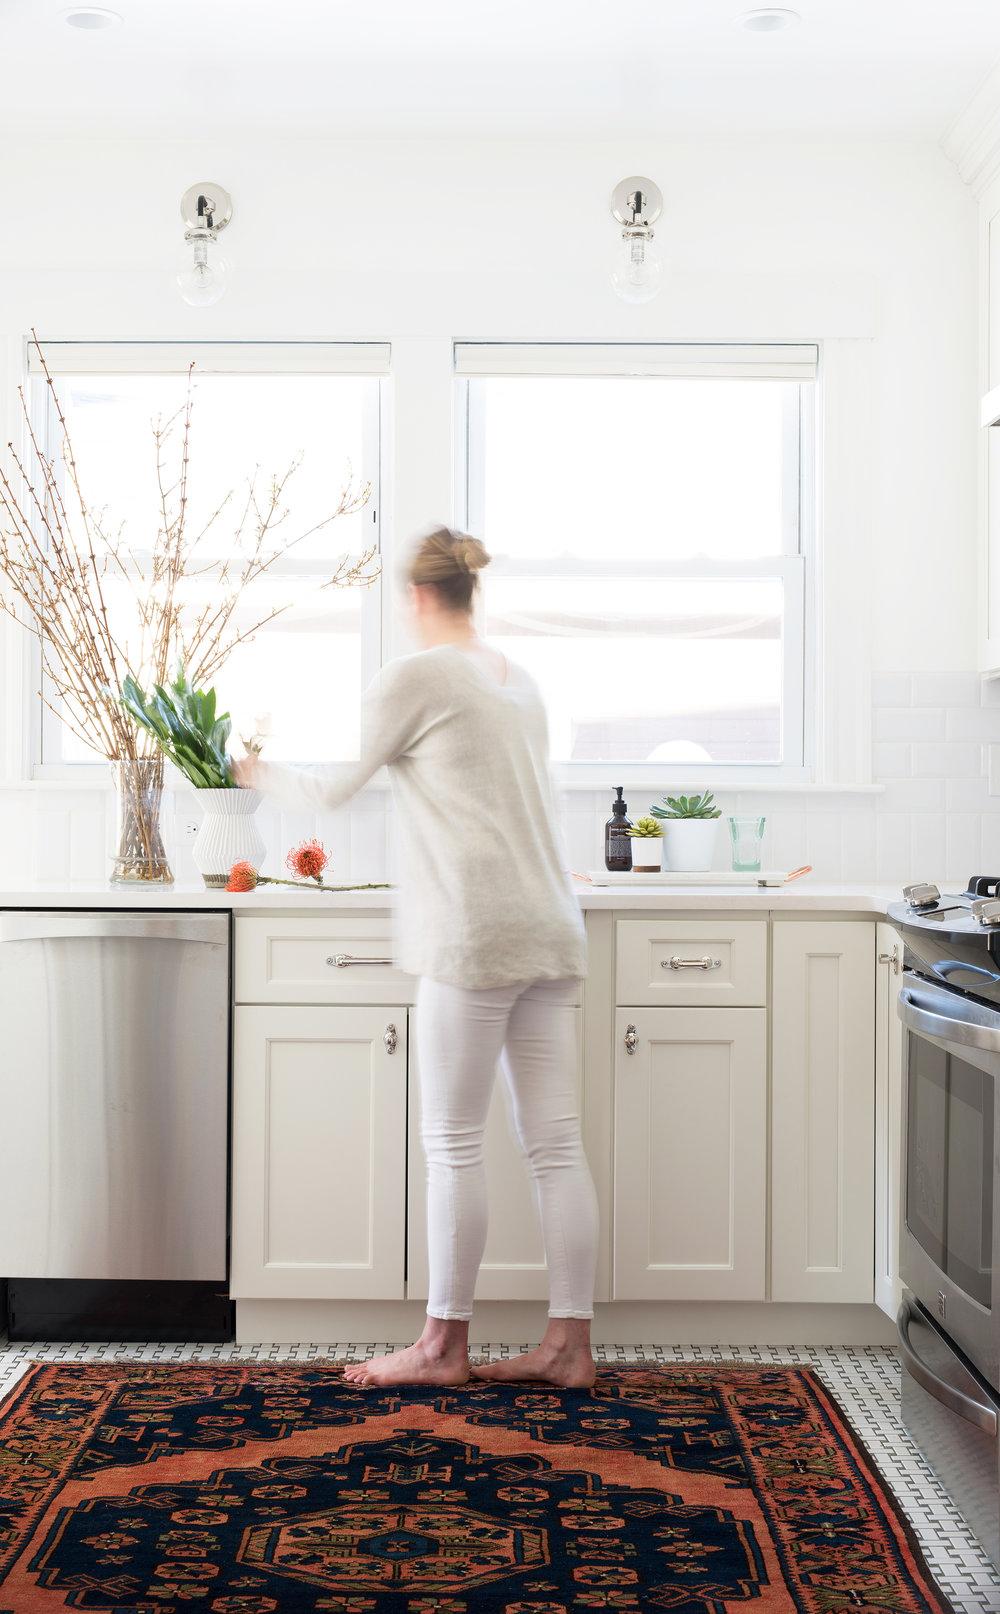 Sarah_Scales_Design_Studio_Wellesley_Kitchen_Design_14 blog.jpg